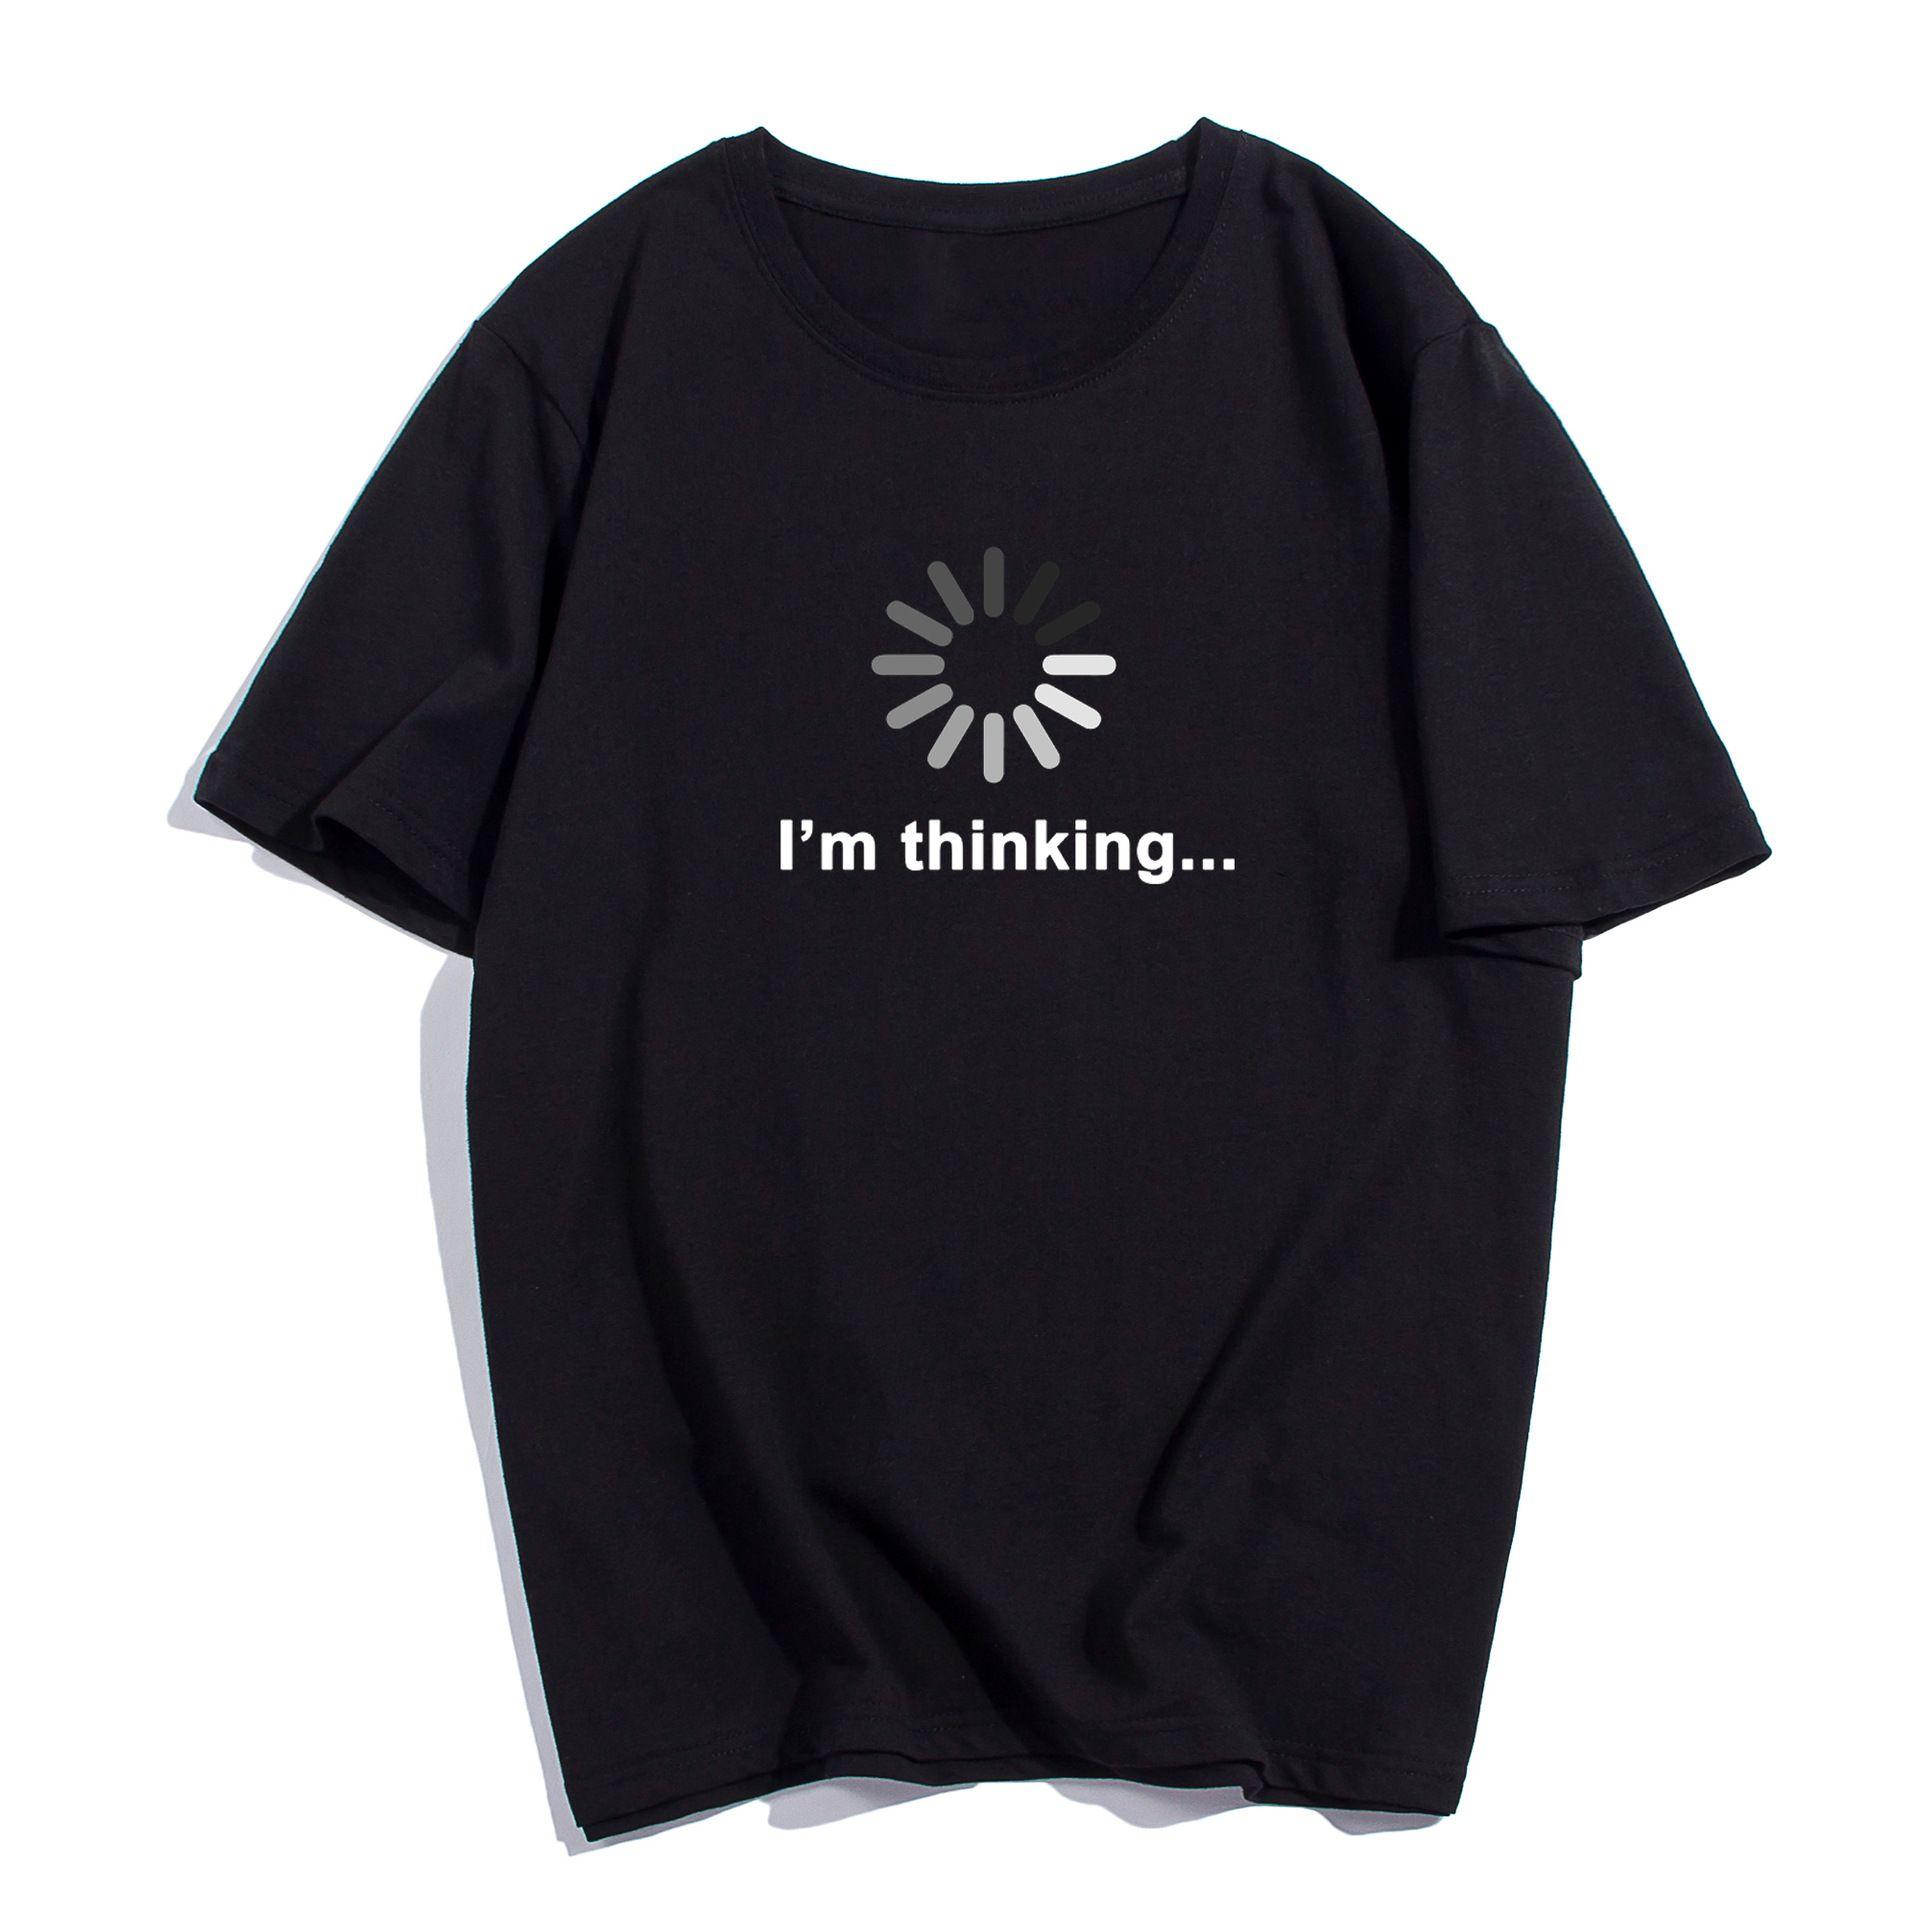 Camiseta con cuello redondo de 2019 Estoy pensando Divertido Impreso Hombres Camiseta de manga corta Depeche Mode Tops Casual Fashion T-shirt T0094